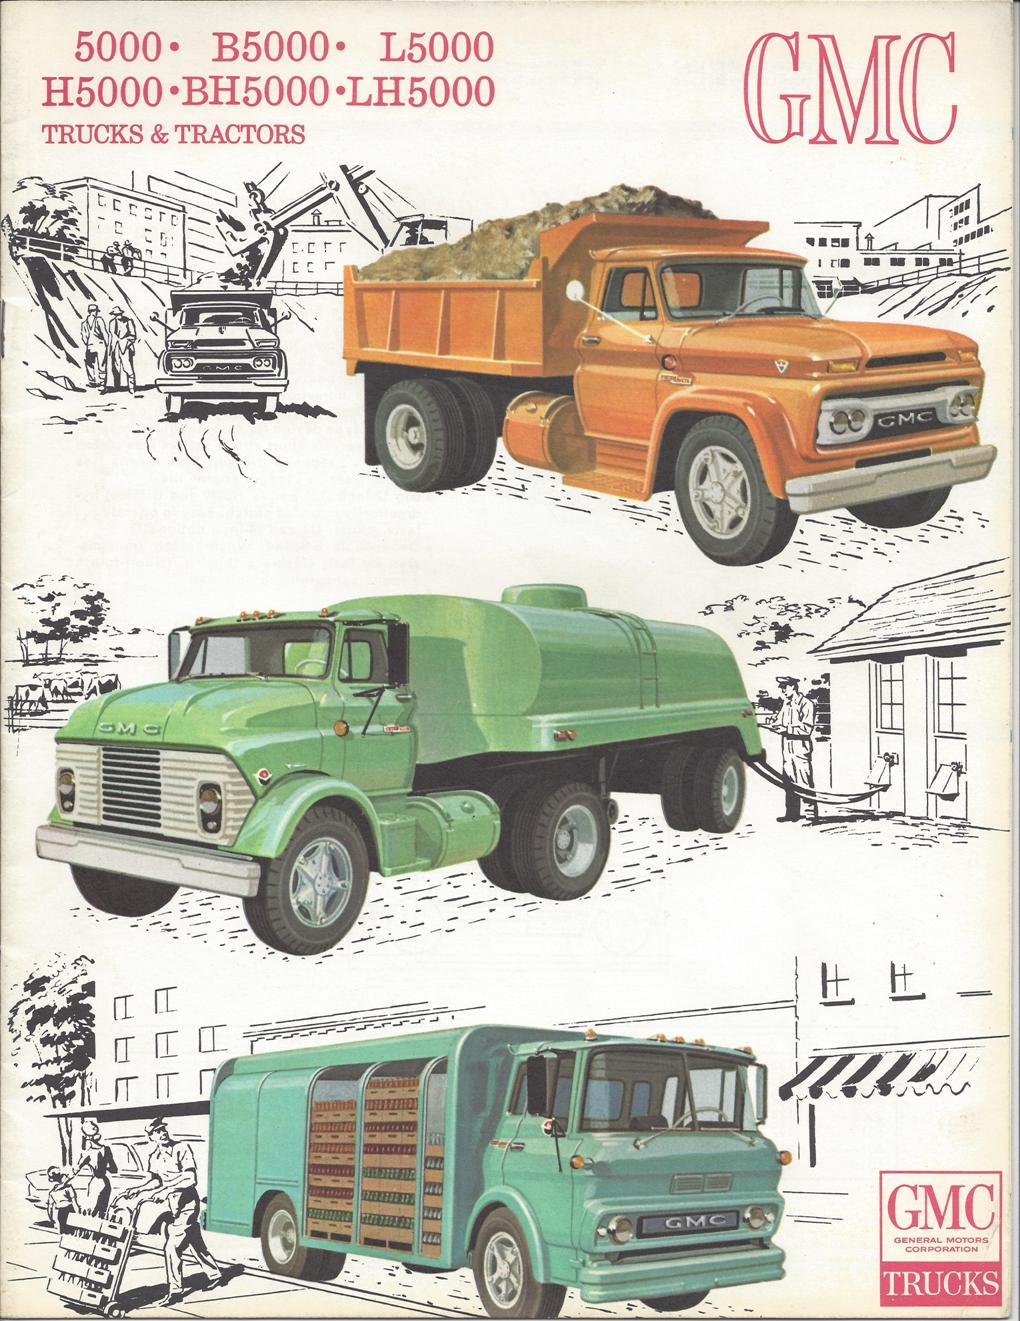 hight resolution of  92 1965 gmc 5000 6x6 truck 5 500